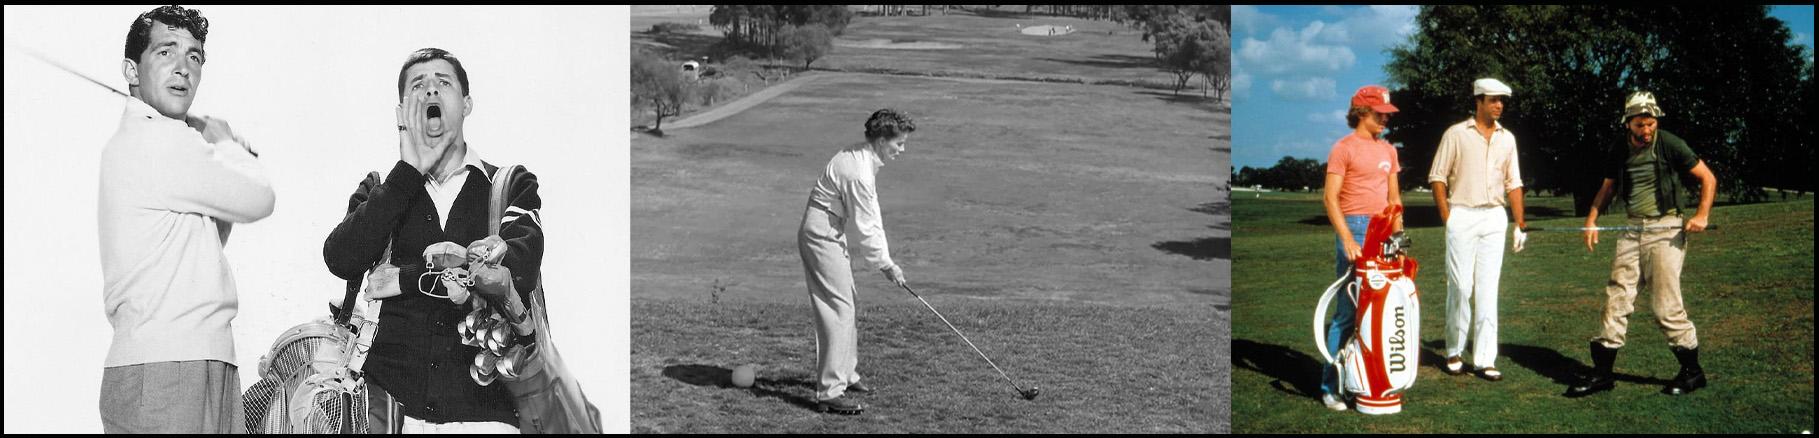 Golffilme